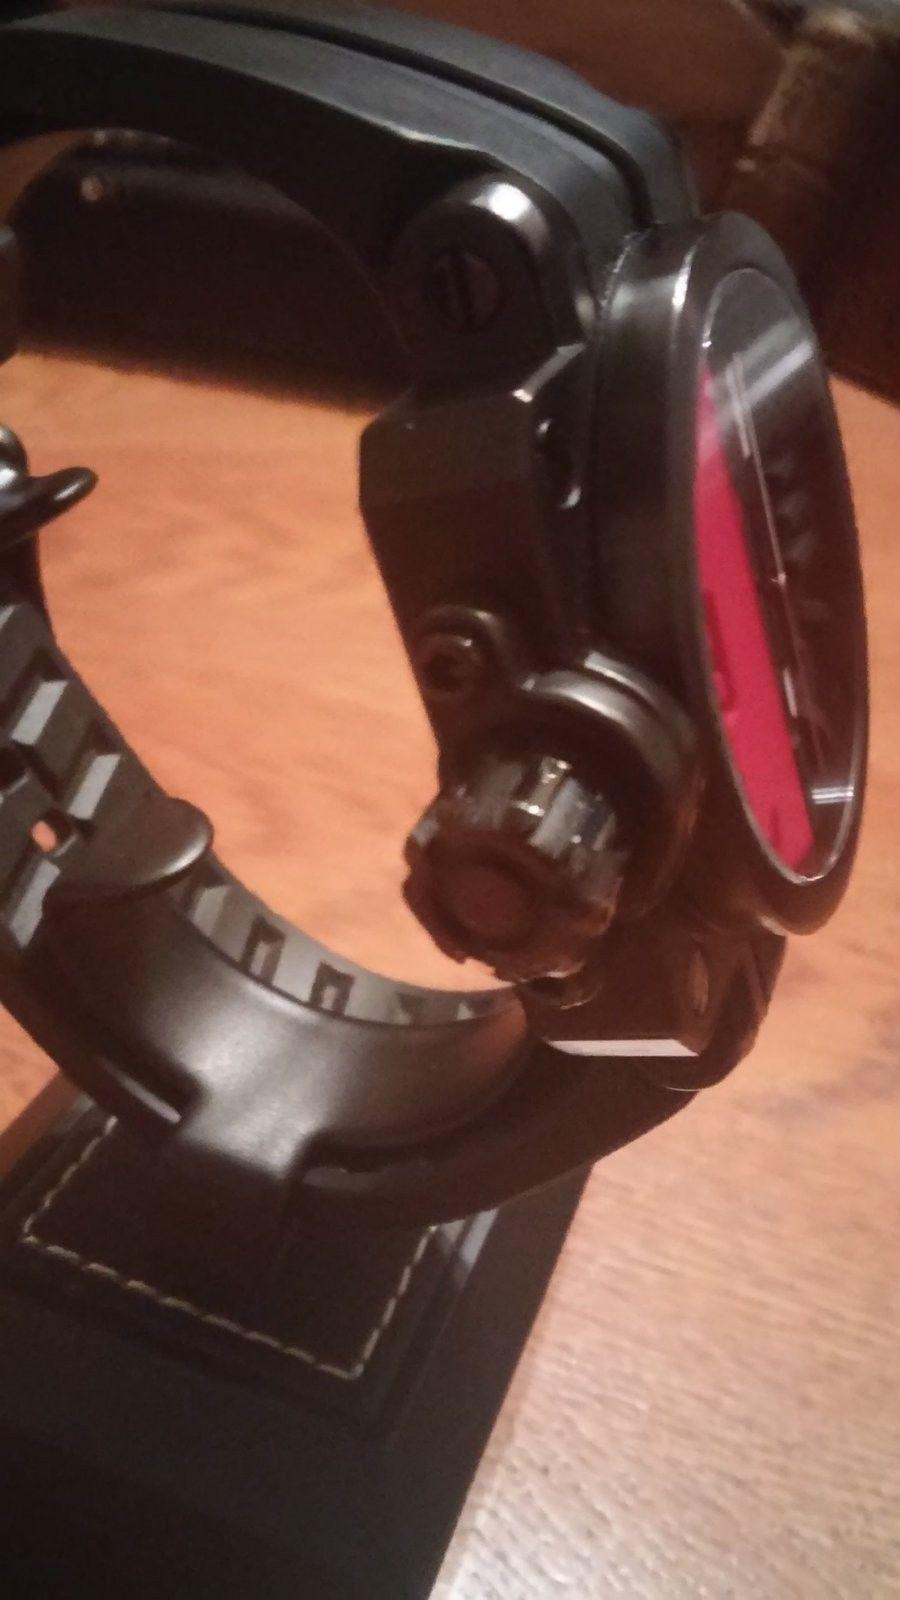 Brazil gearbox watch - 20150618_073916_HDR.jpg